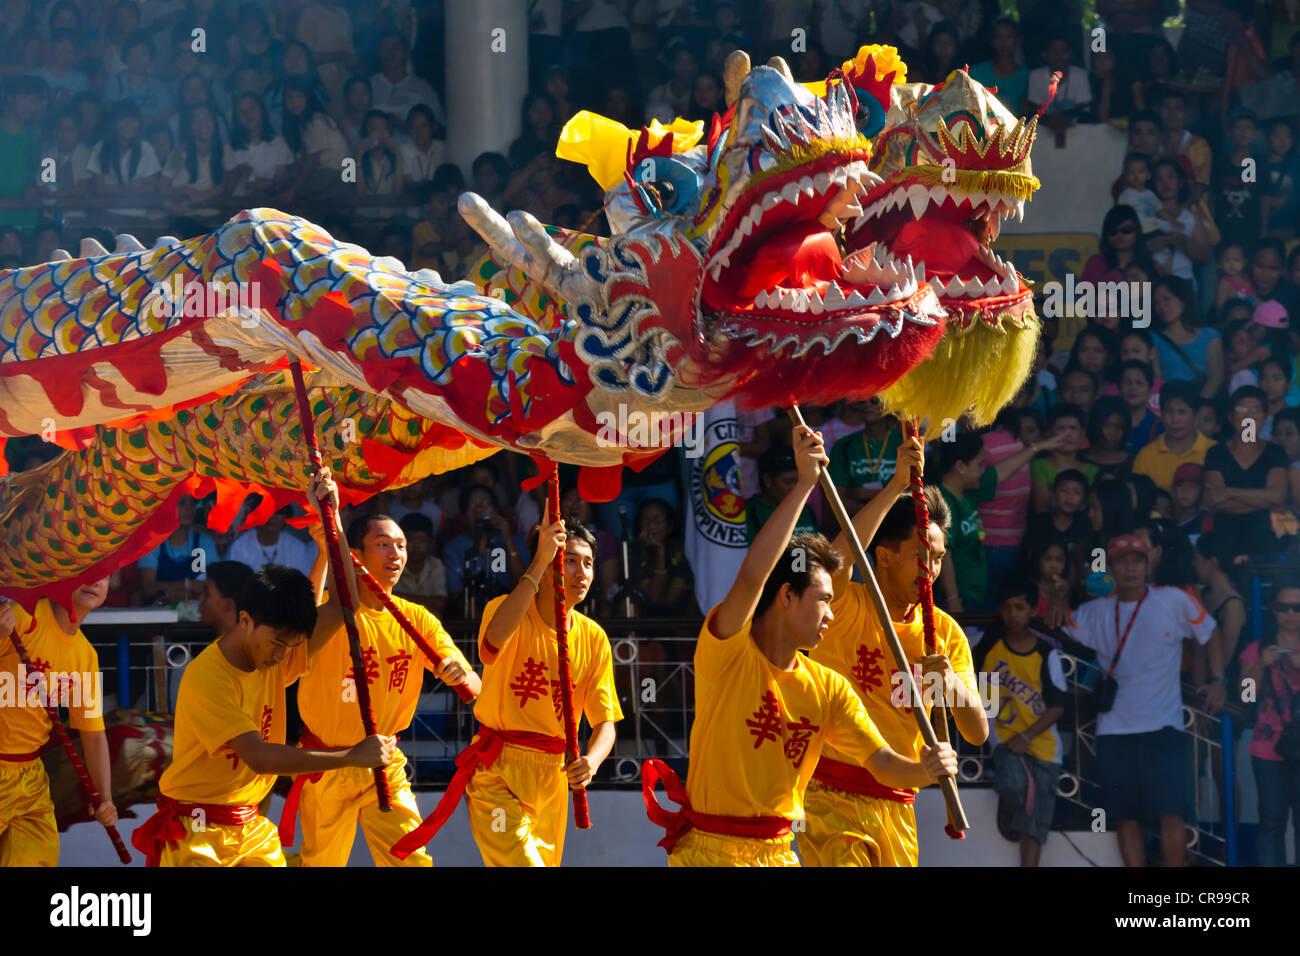 dragon dance performance celebrating